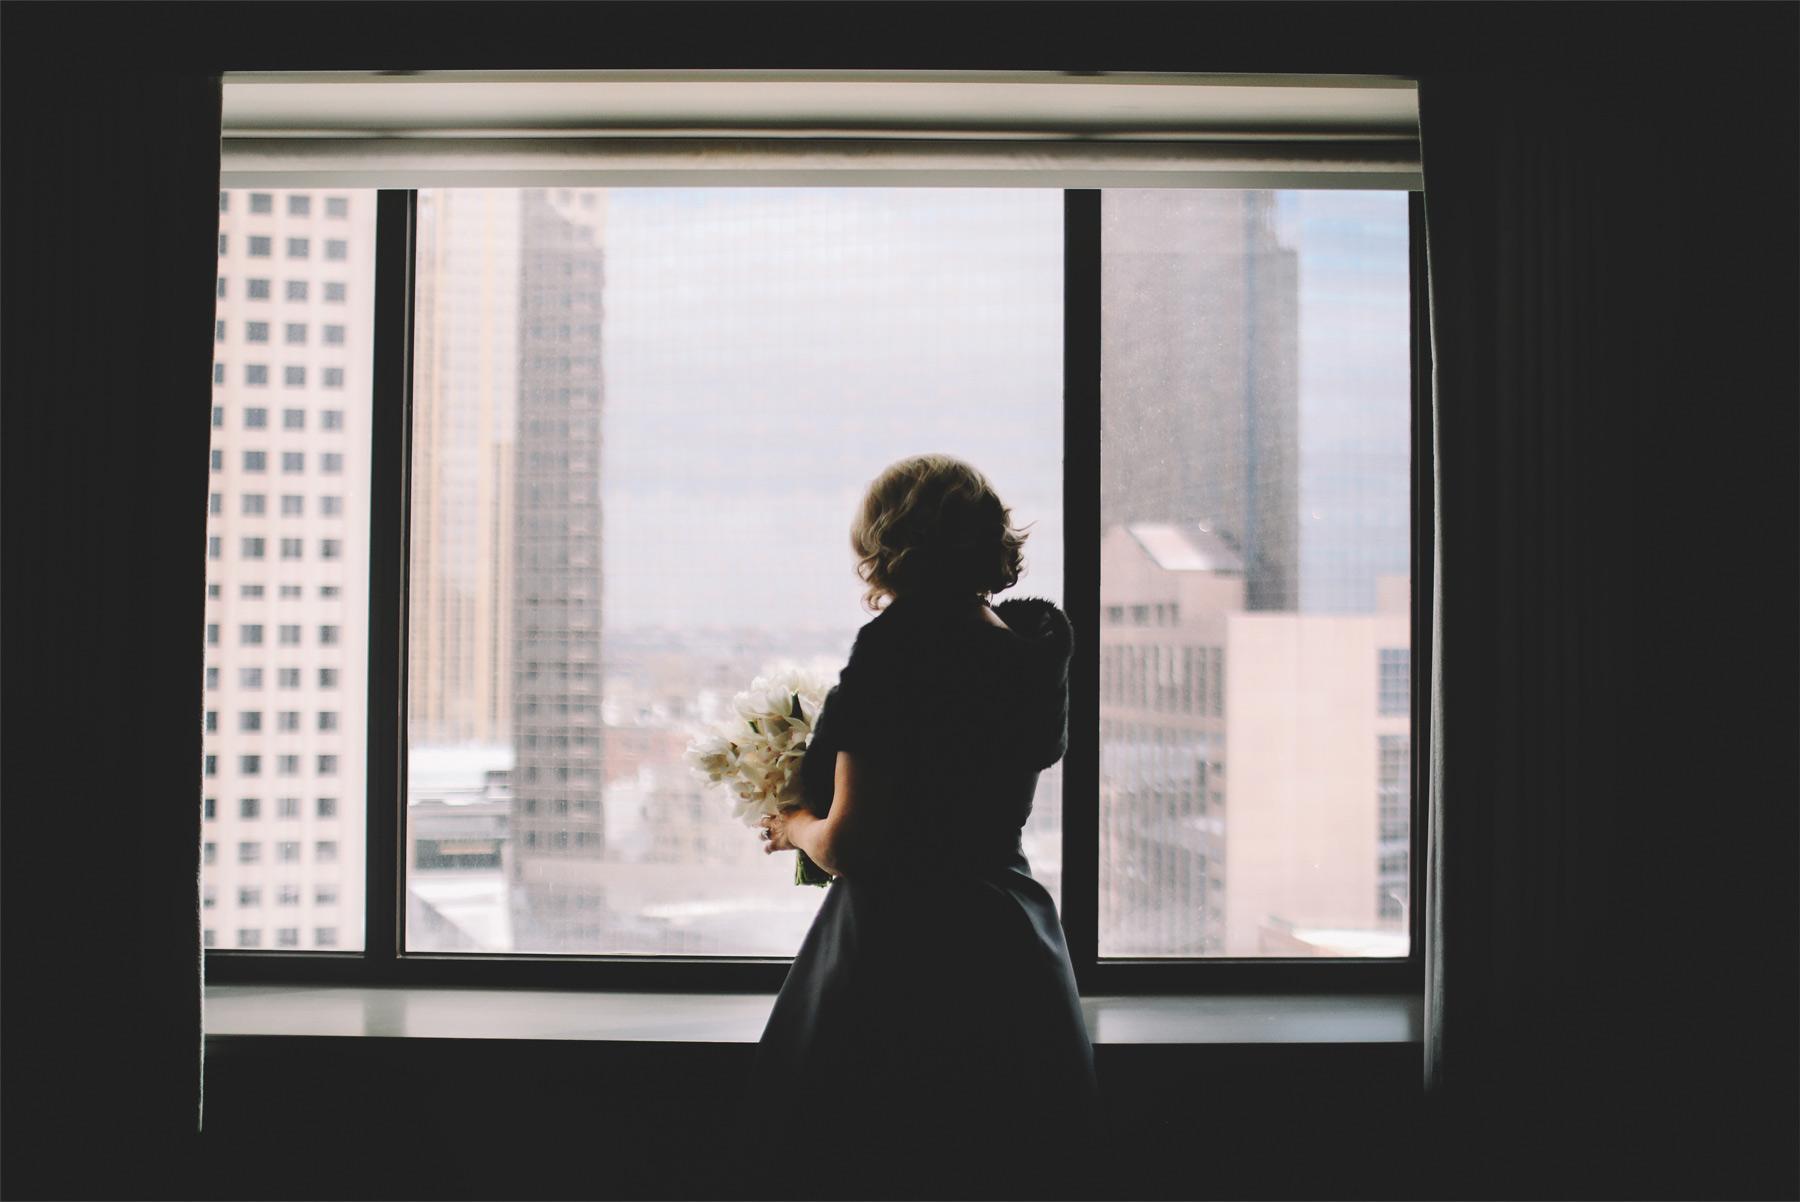 01-Minneapolis-Minnesota-Wedding-Photography-by-Vick-Photography-Loews-Hotel-Bride-Wedding-Morning-Silhouette-Joan-and-Tim.jpg